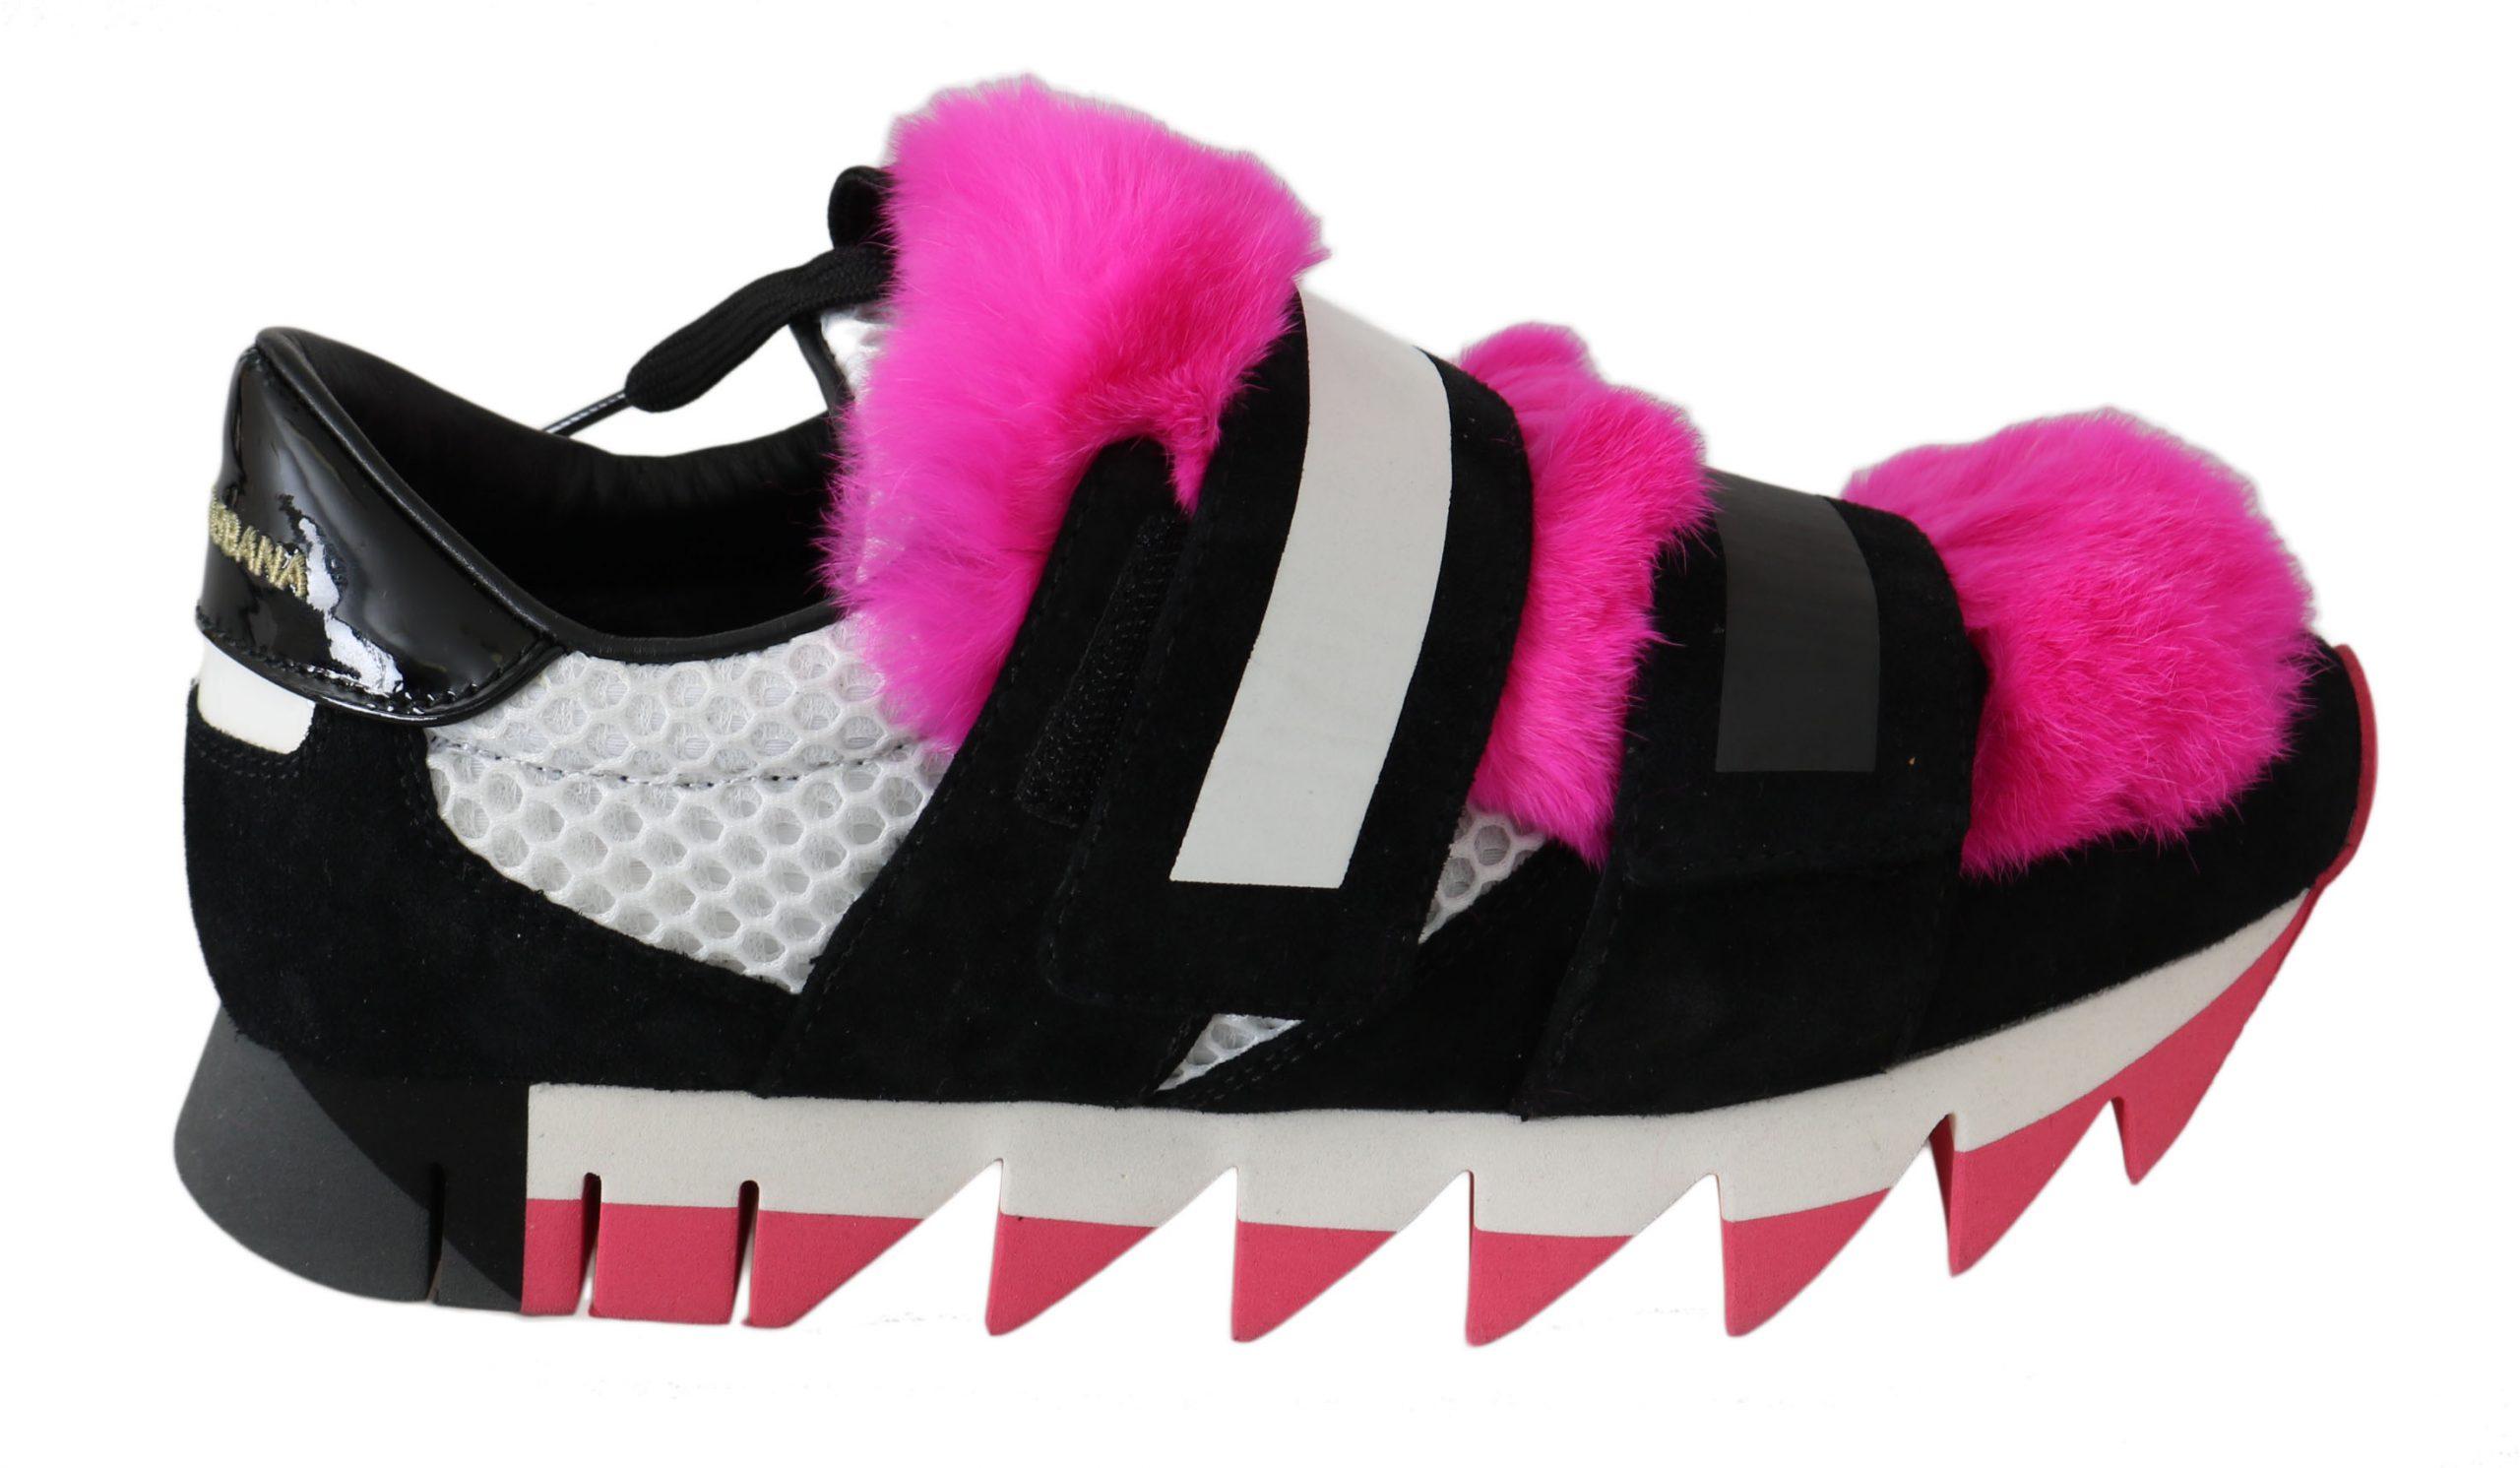 Dolce & Gabbana Women's Leather Pink Fur Trainer Black LA5934 - EU39/US6